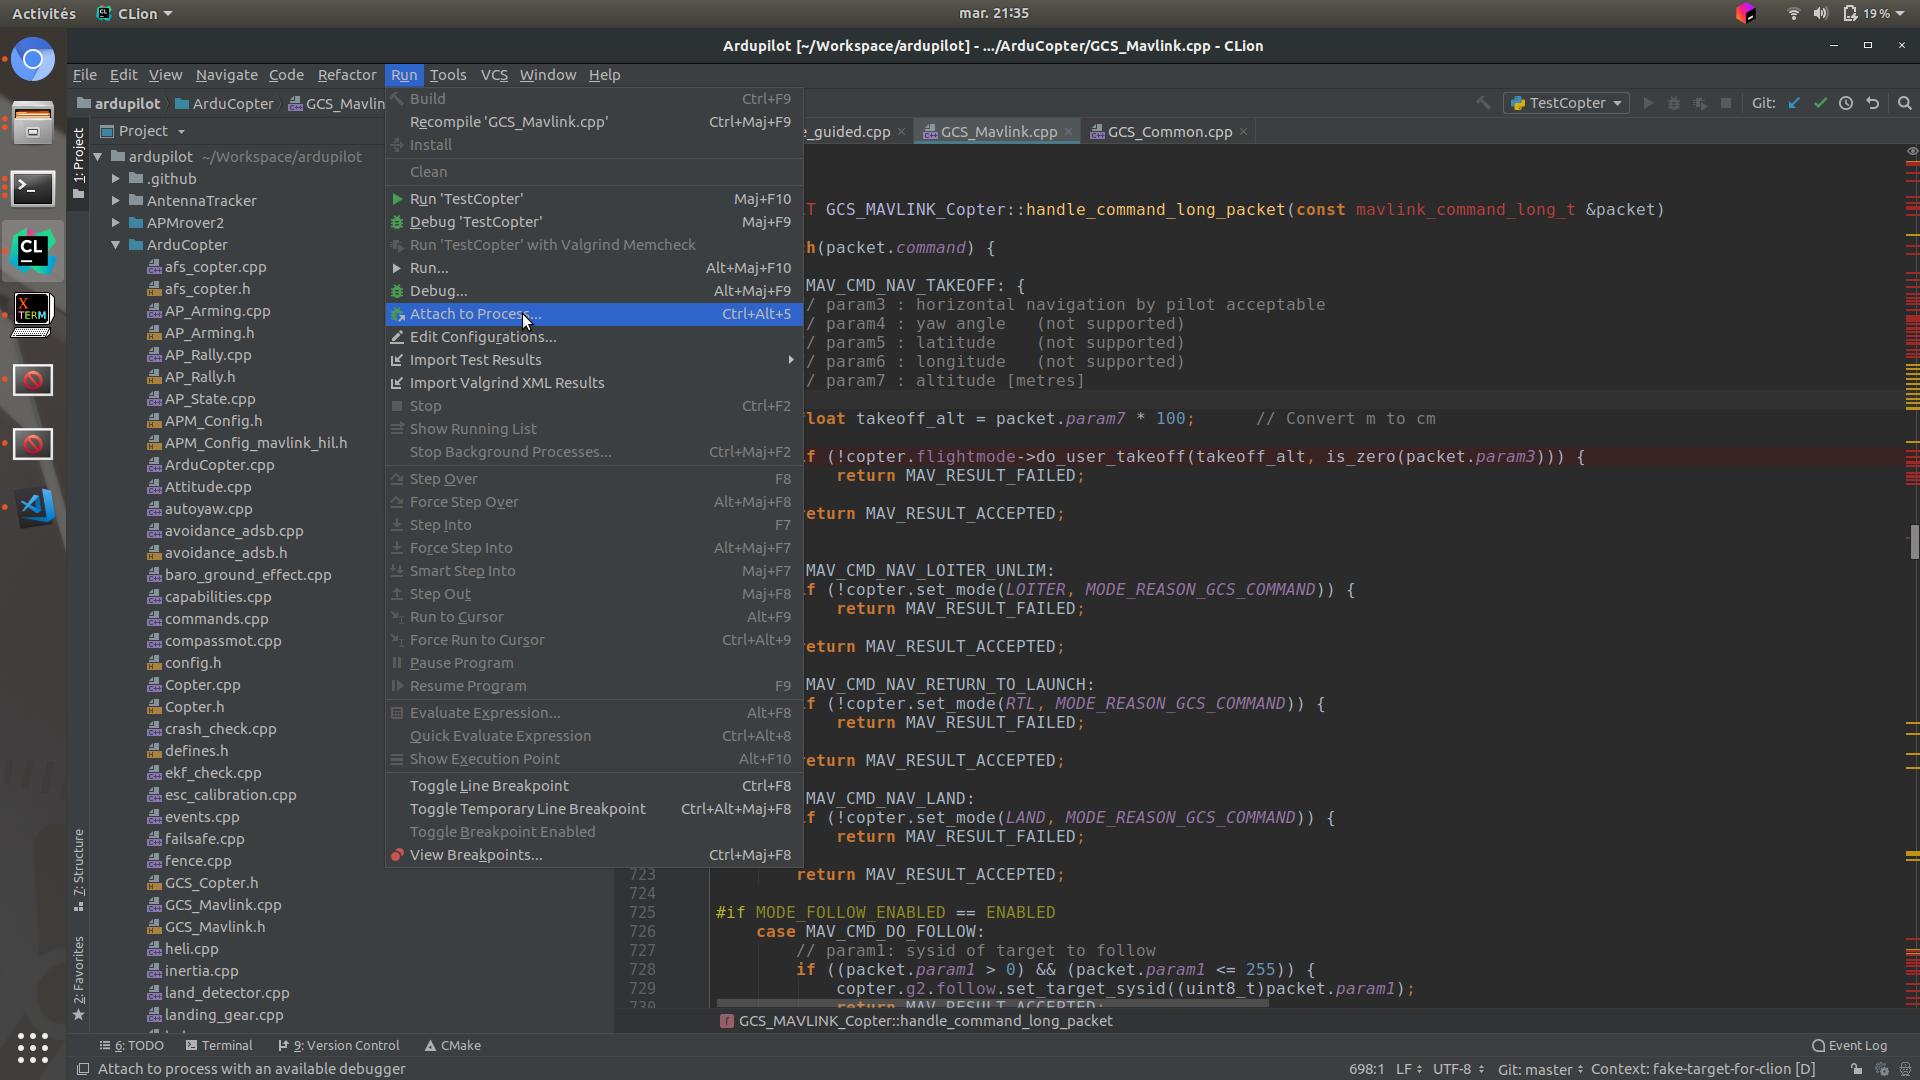 Debugging with GDB on linux — Dev documentation